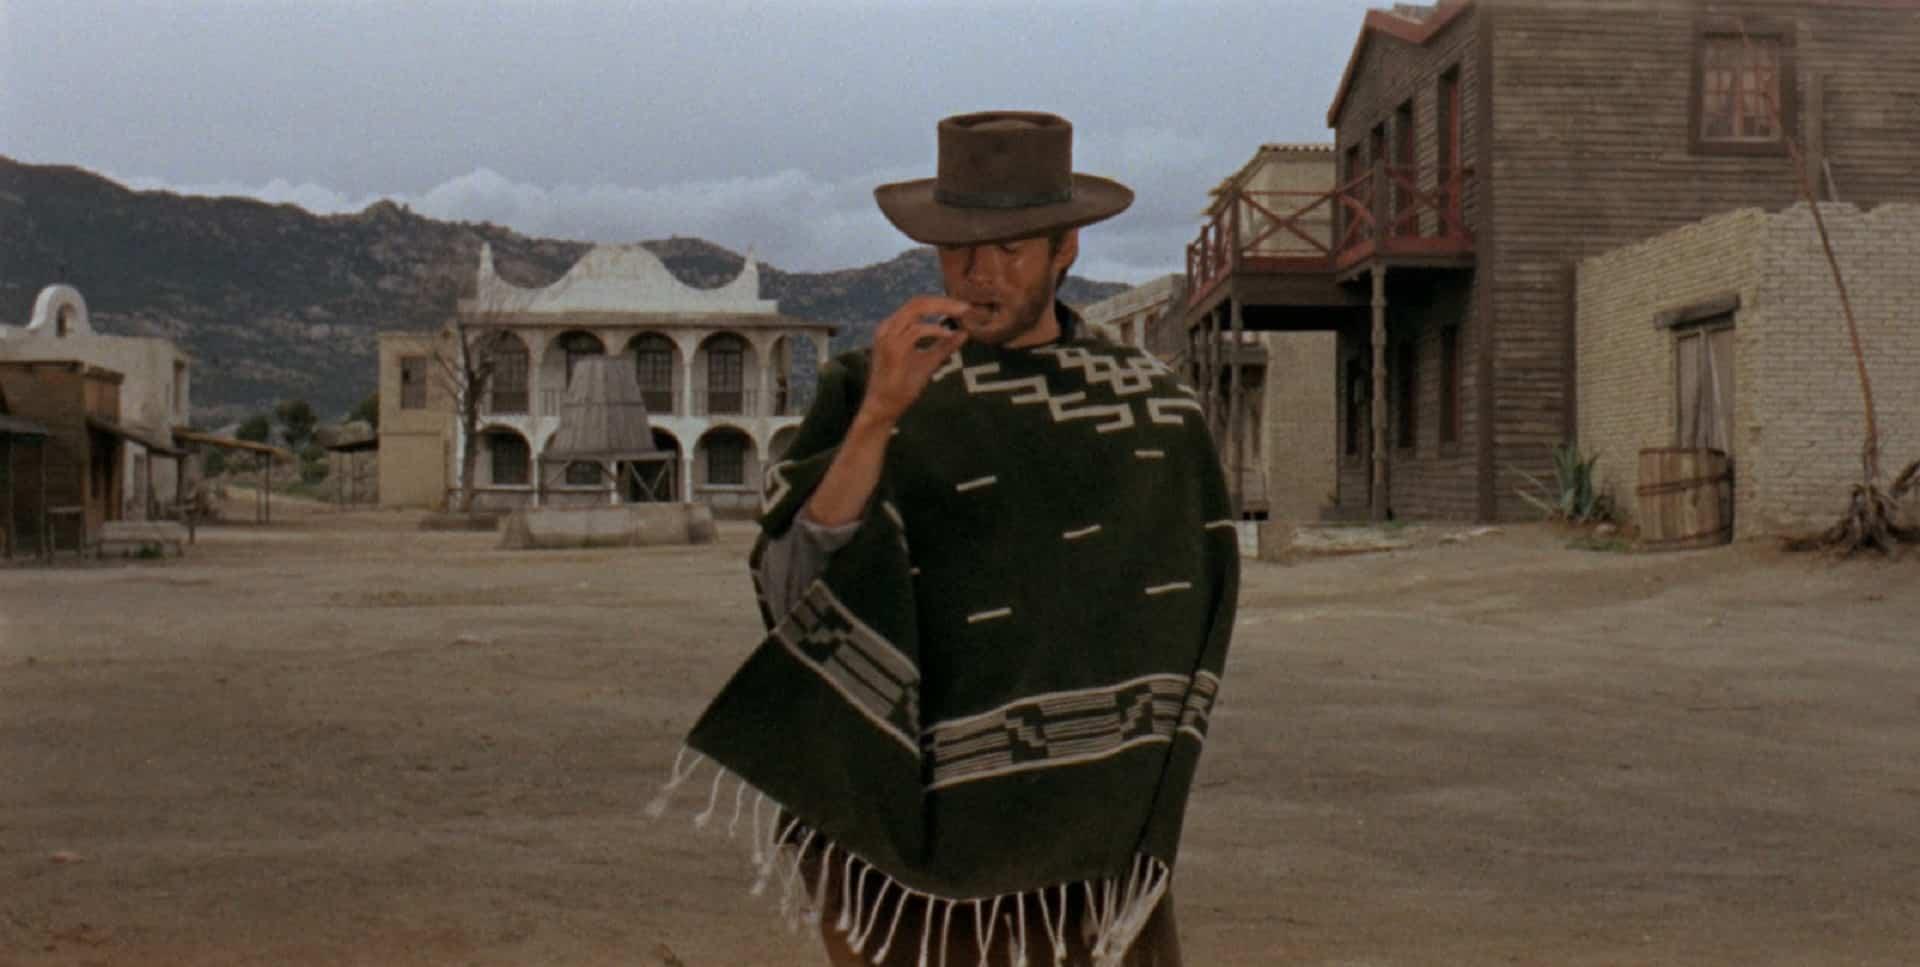 clint eastwood, trilogia del dollaro, spaghetti western, cinematown.it